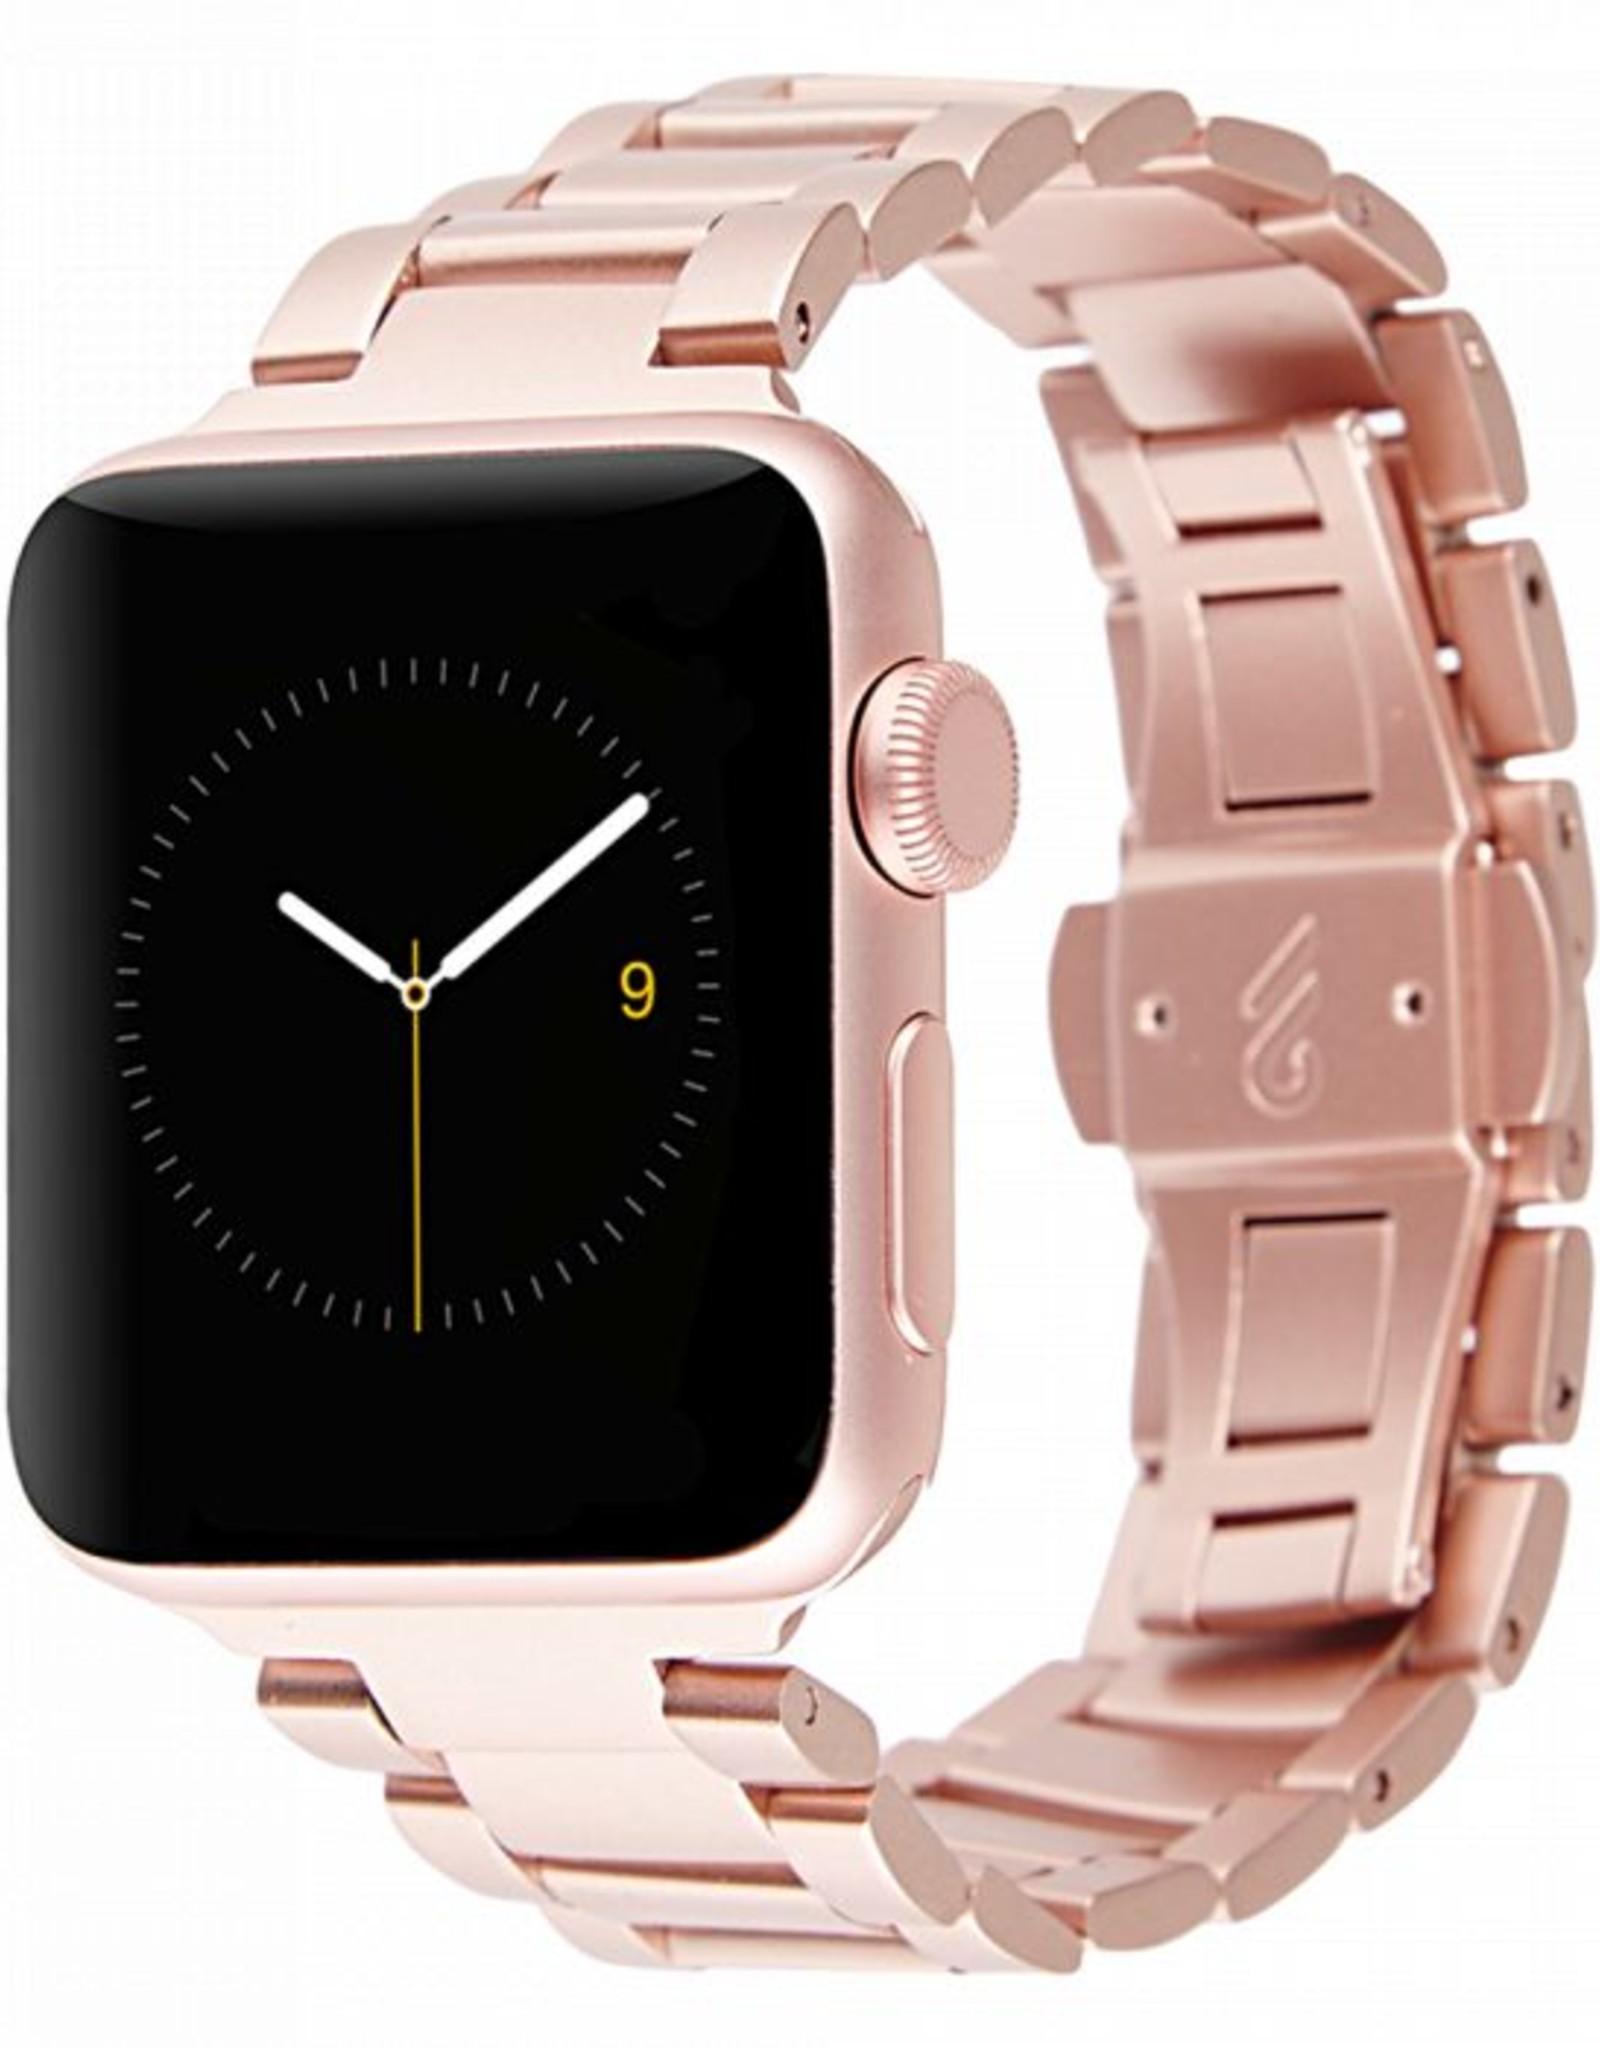 Case-Mate Apple Case-mate Rose Gold Metal Linked Watchband - 38mm 15-02684